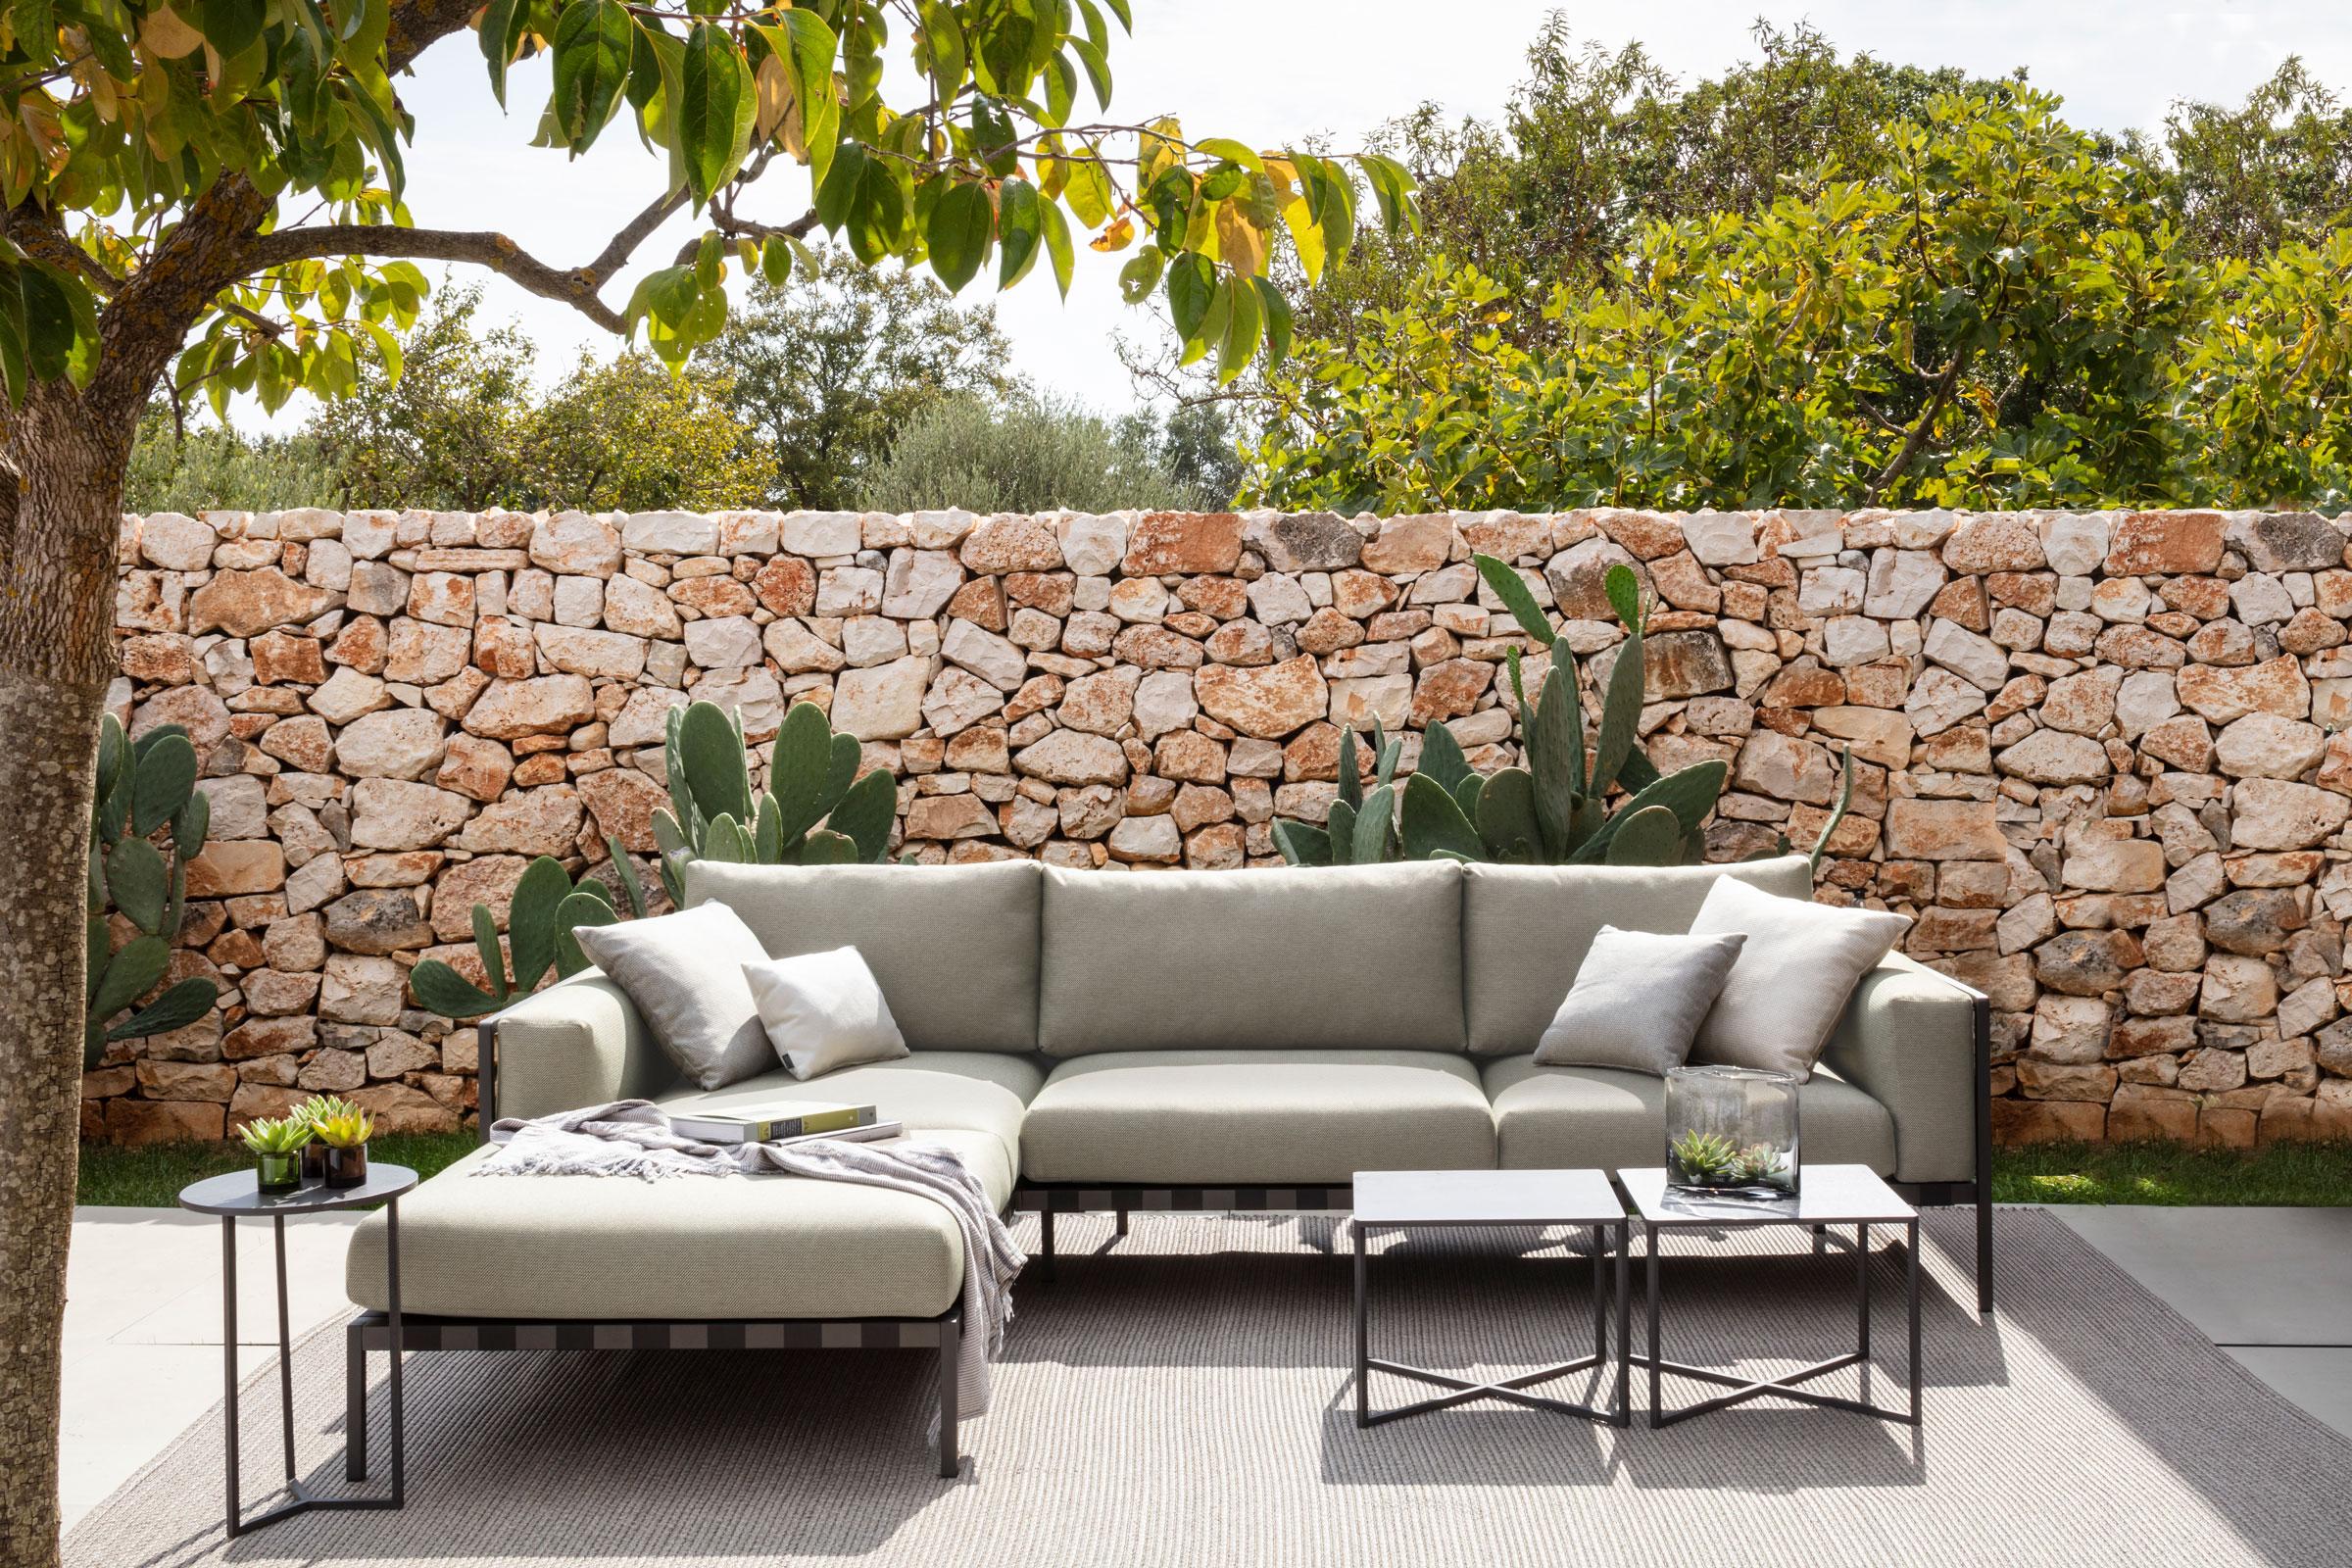 hauser-design-loungesituation-alu-natal-von-tribu